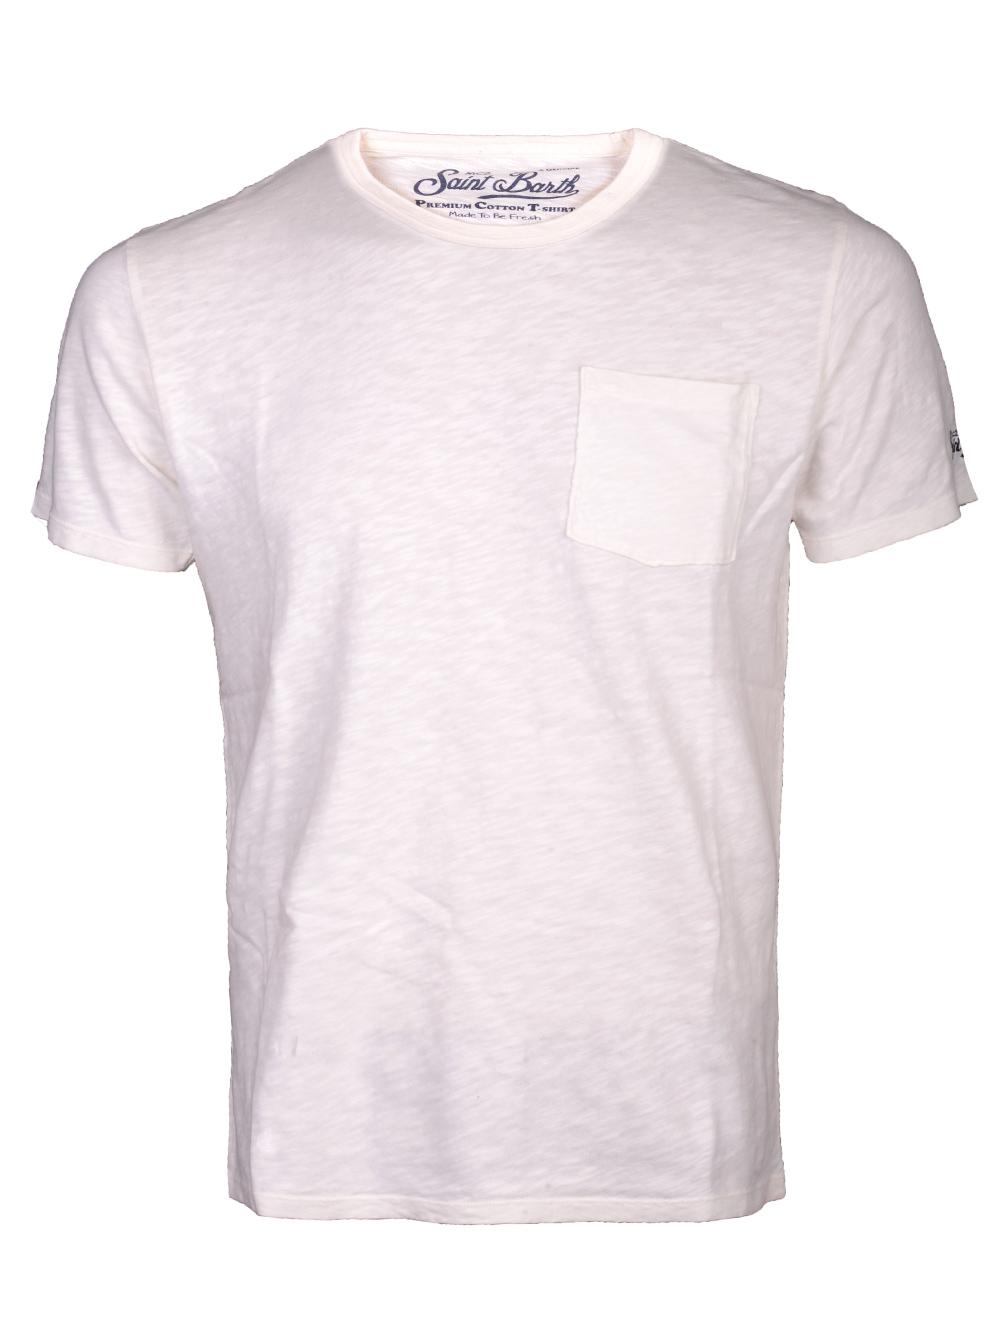 Mc2 St.BarthSALT WATER Μπλούζα t-shirt PRE0001 ΕΚΡΟΥ